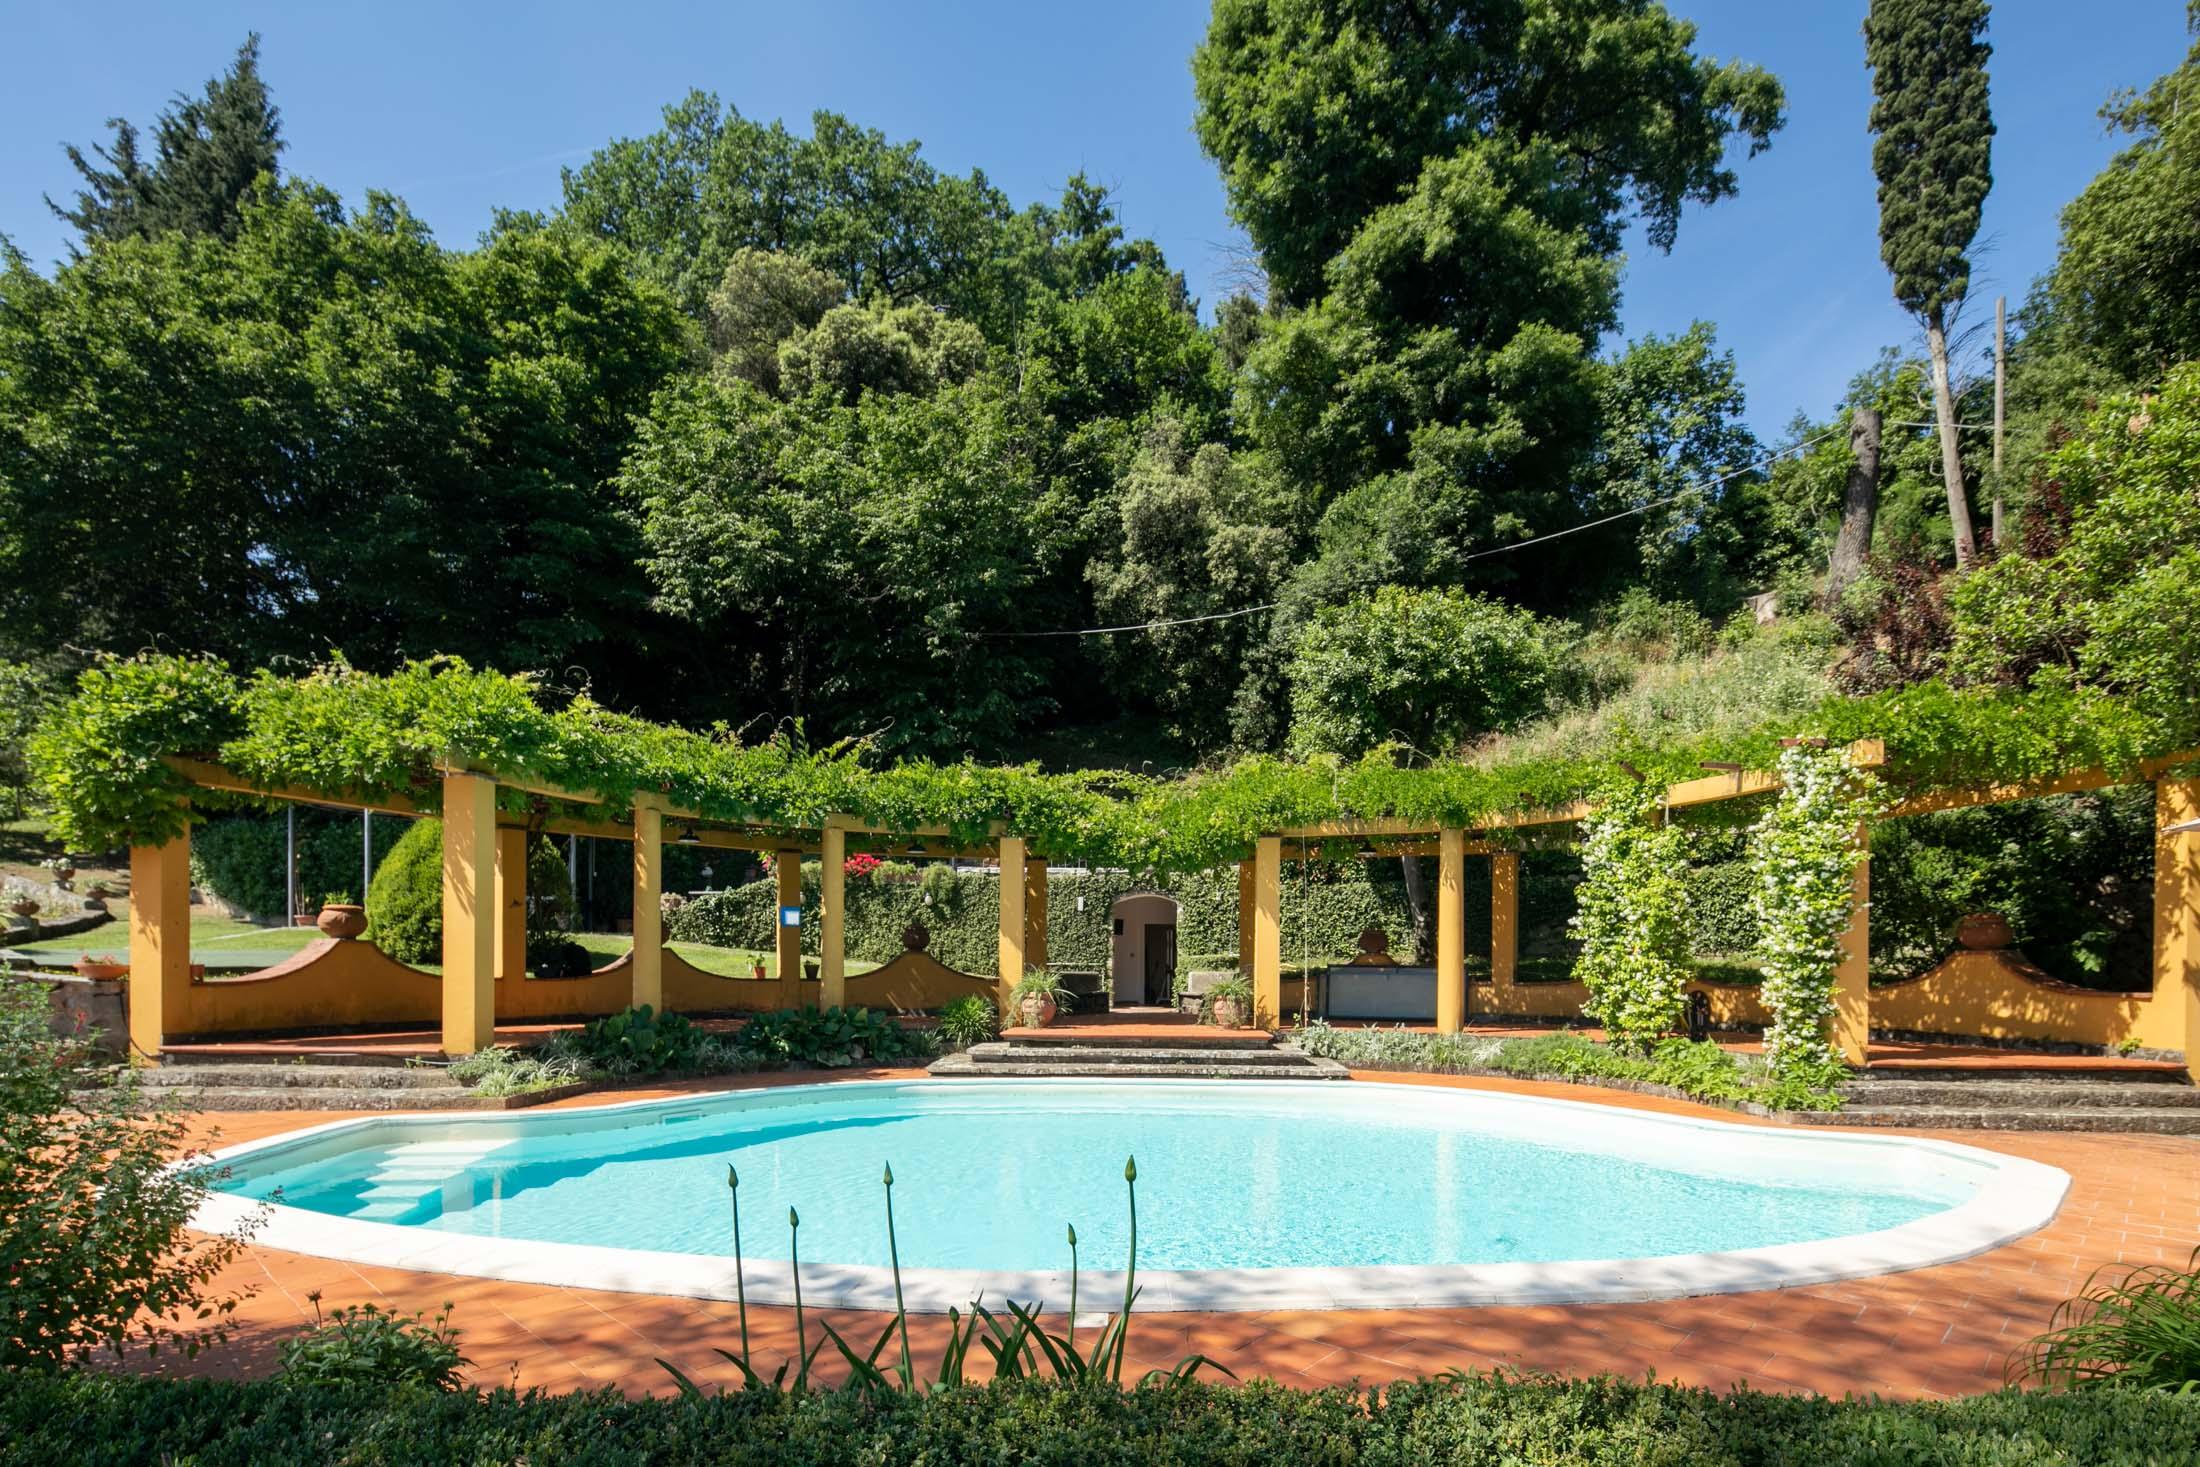 Villa<br> in Pian dei Giullari with pool